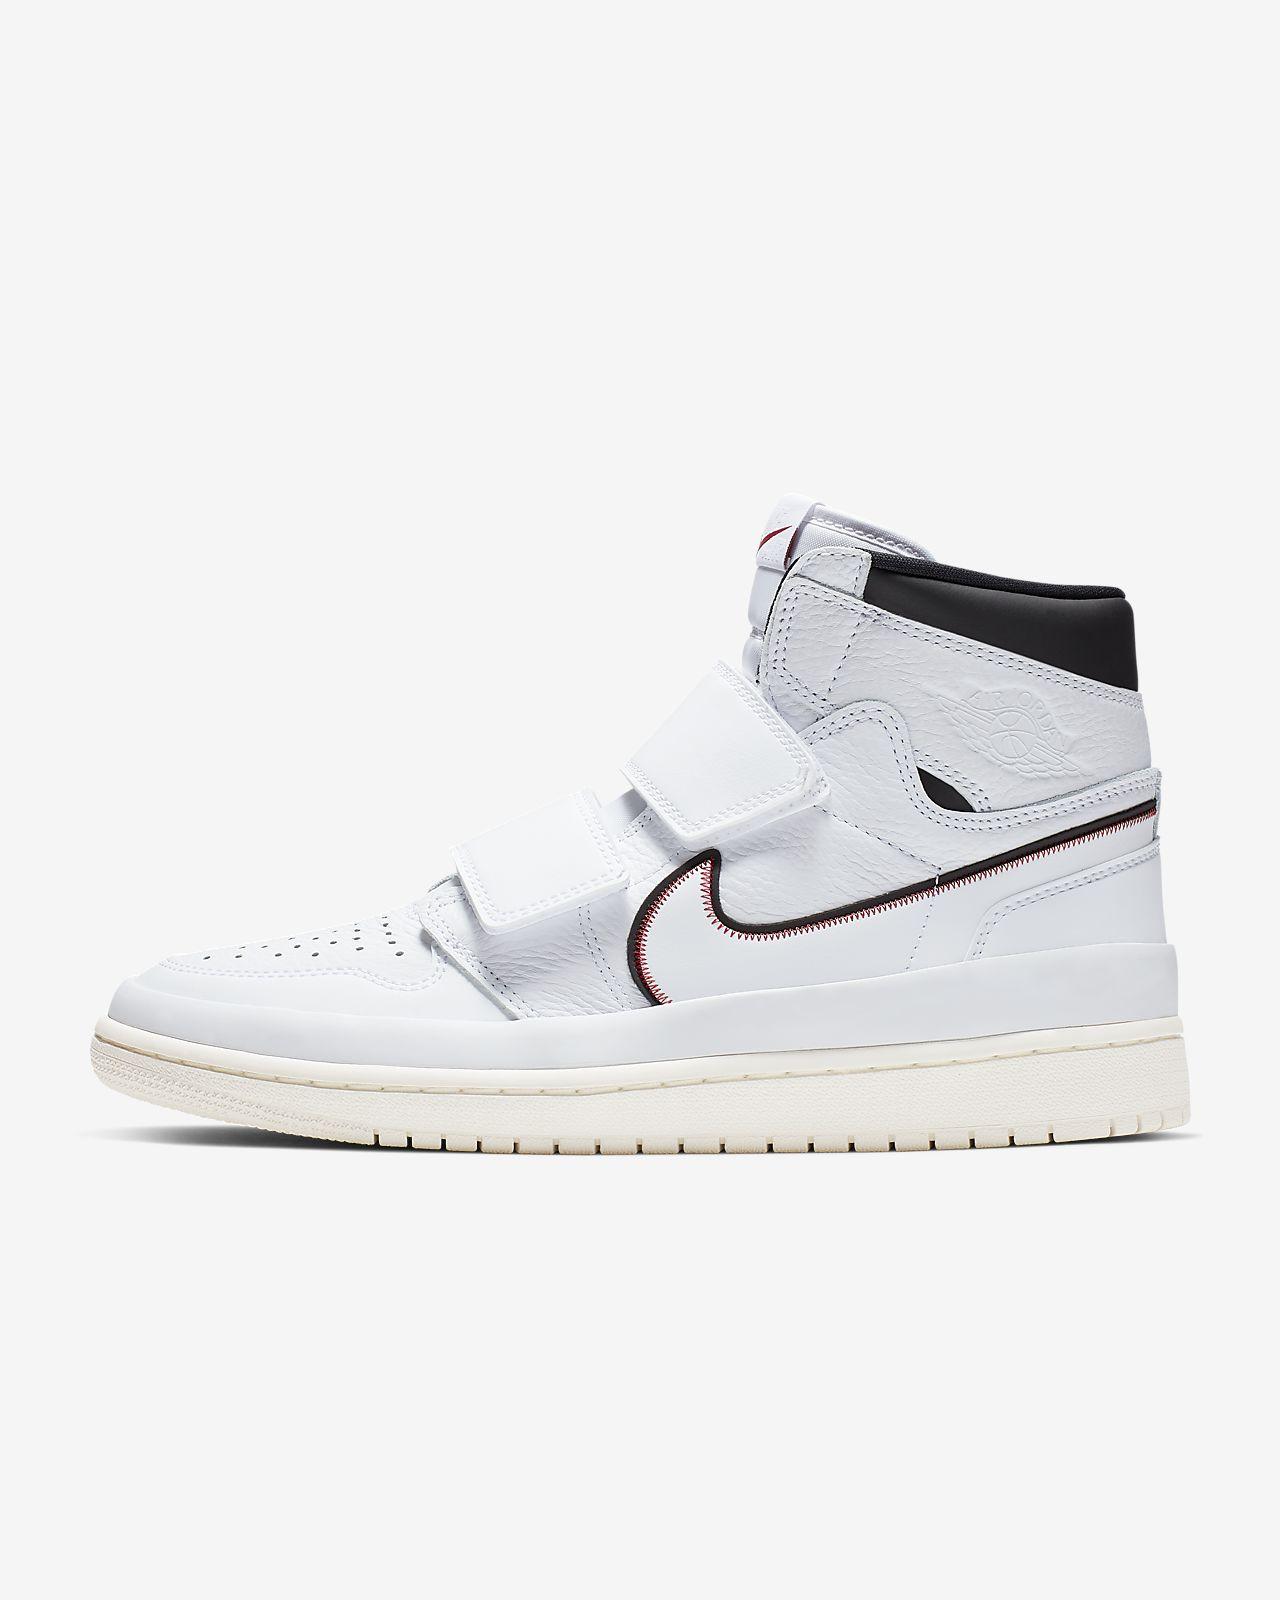 0fad4c04ad8 Chaussure Air Jordan 1 Retro High Double Strap pour Homme. Nike.com BE